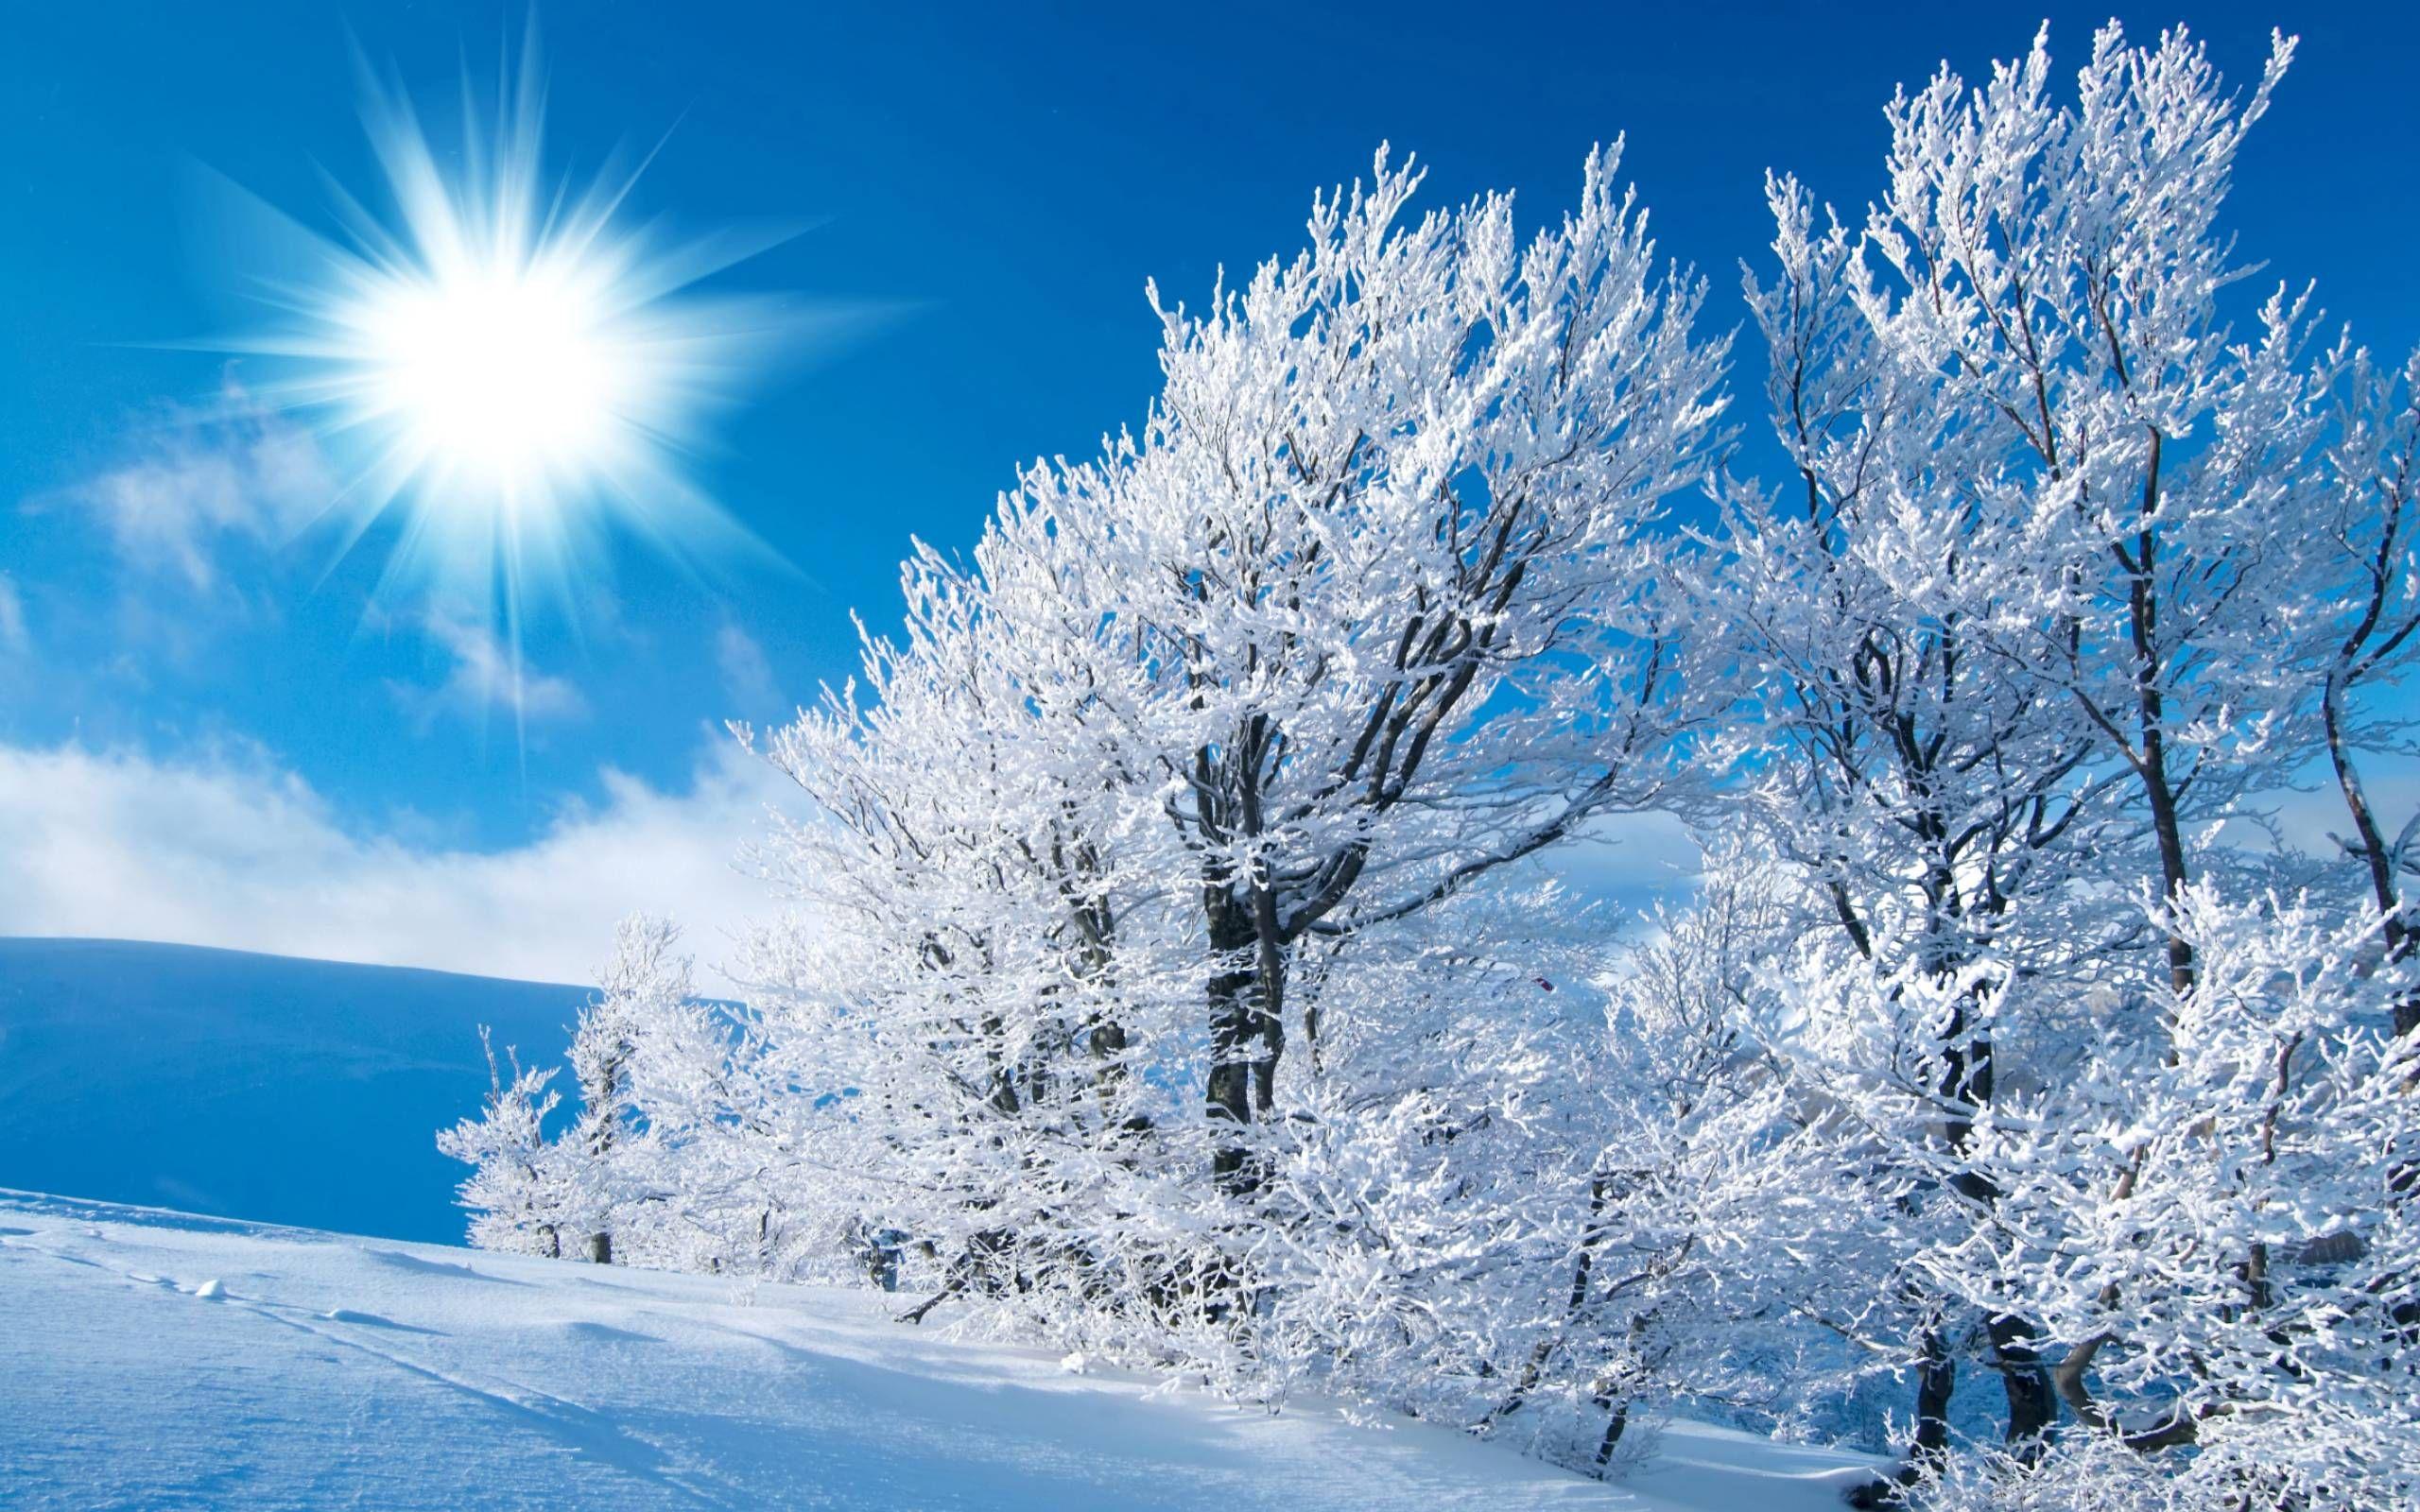 Winter Nature Wallpapers Hd Resolution | Iarna | Winter wallpaper, Wallpaper, Winter